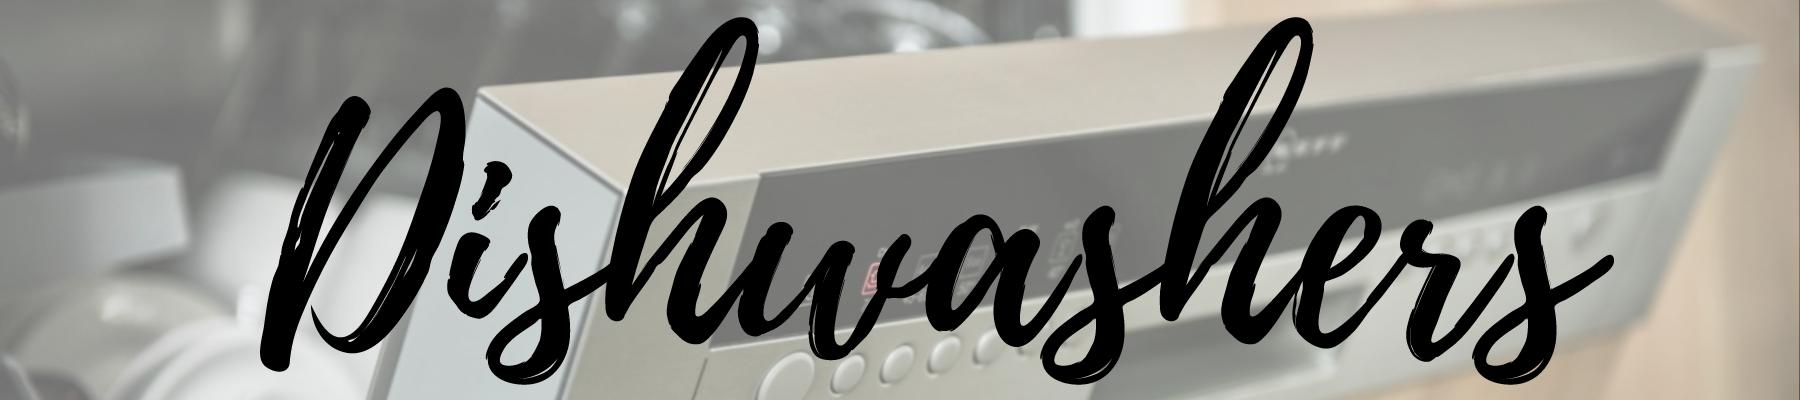 main-dishwashers-banner.png